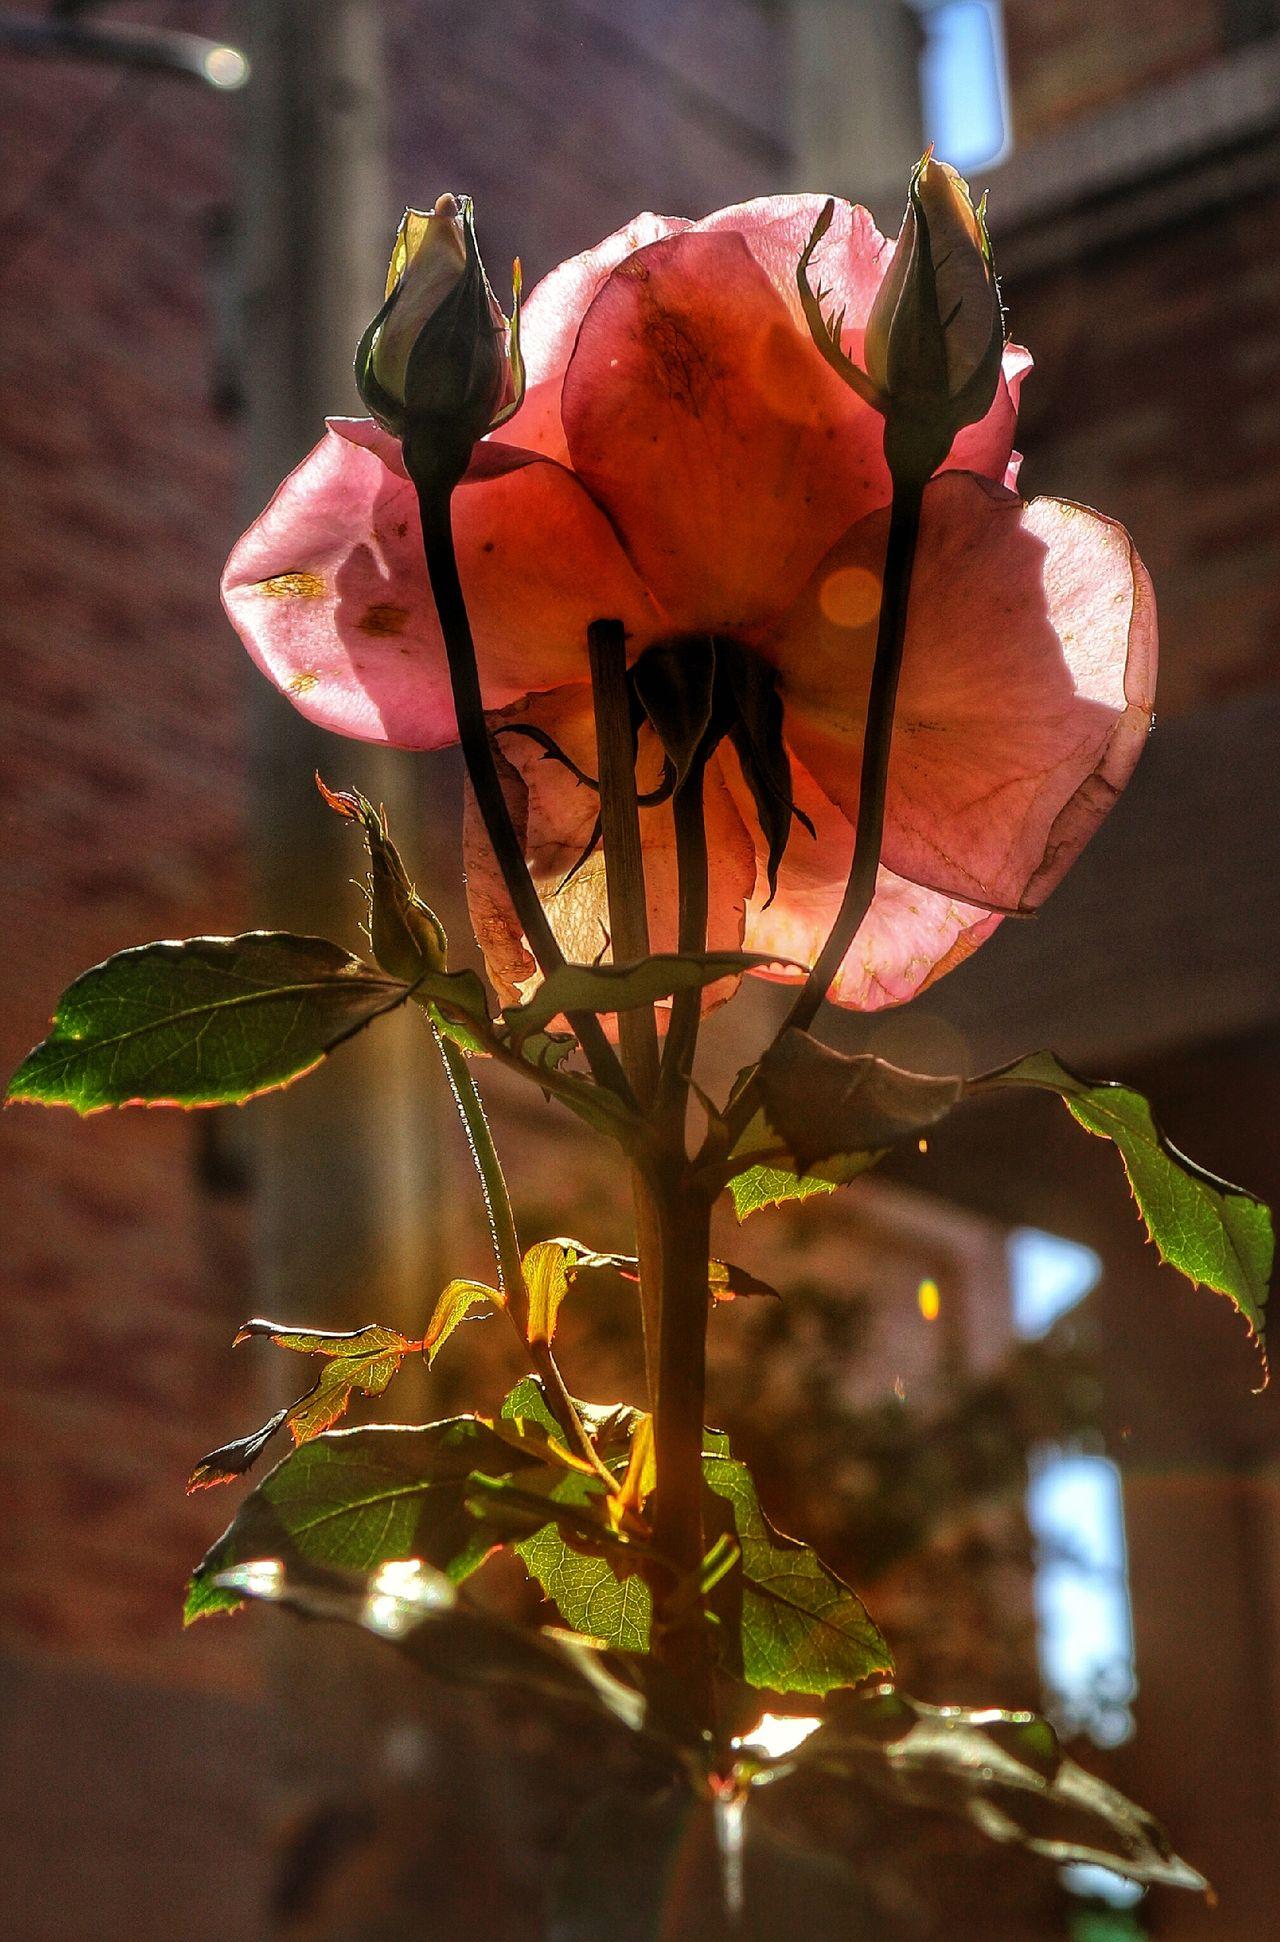 My Garden My Garden @my Home Roses Pink Rose Day Light Flowers Flowers,Plants & Garden Daydreaming